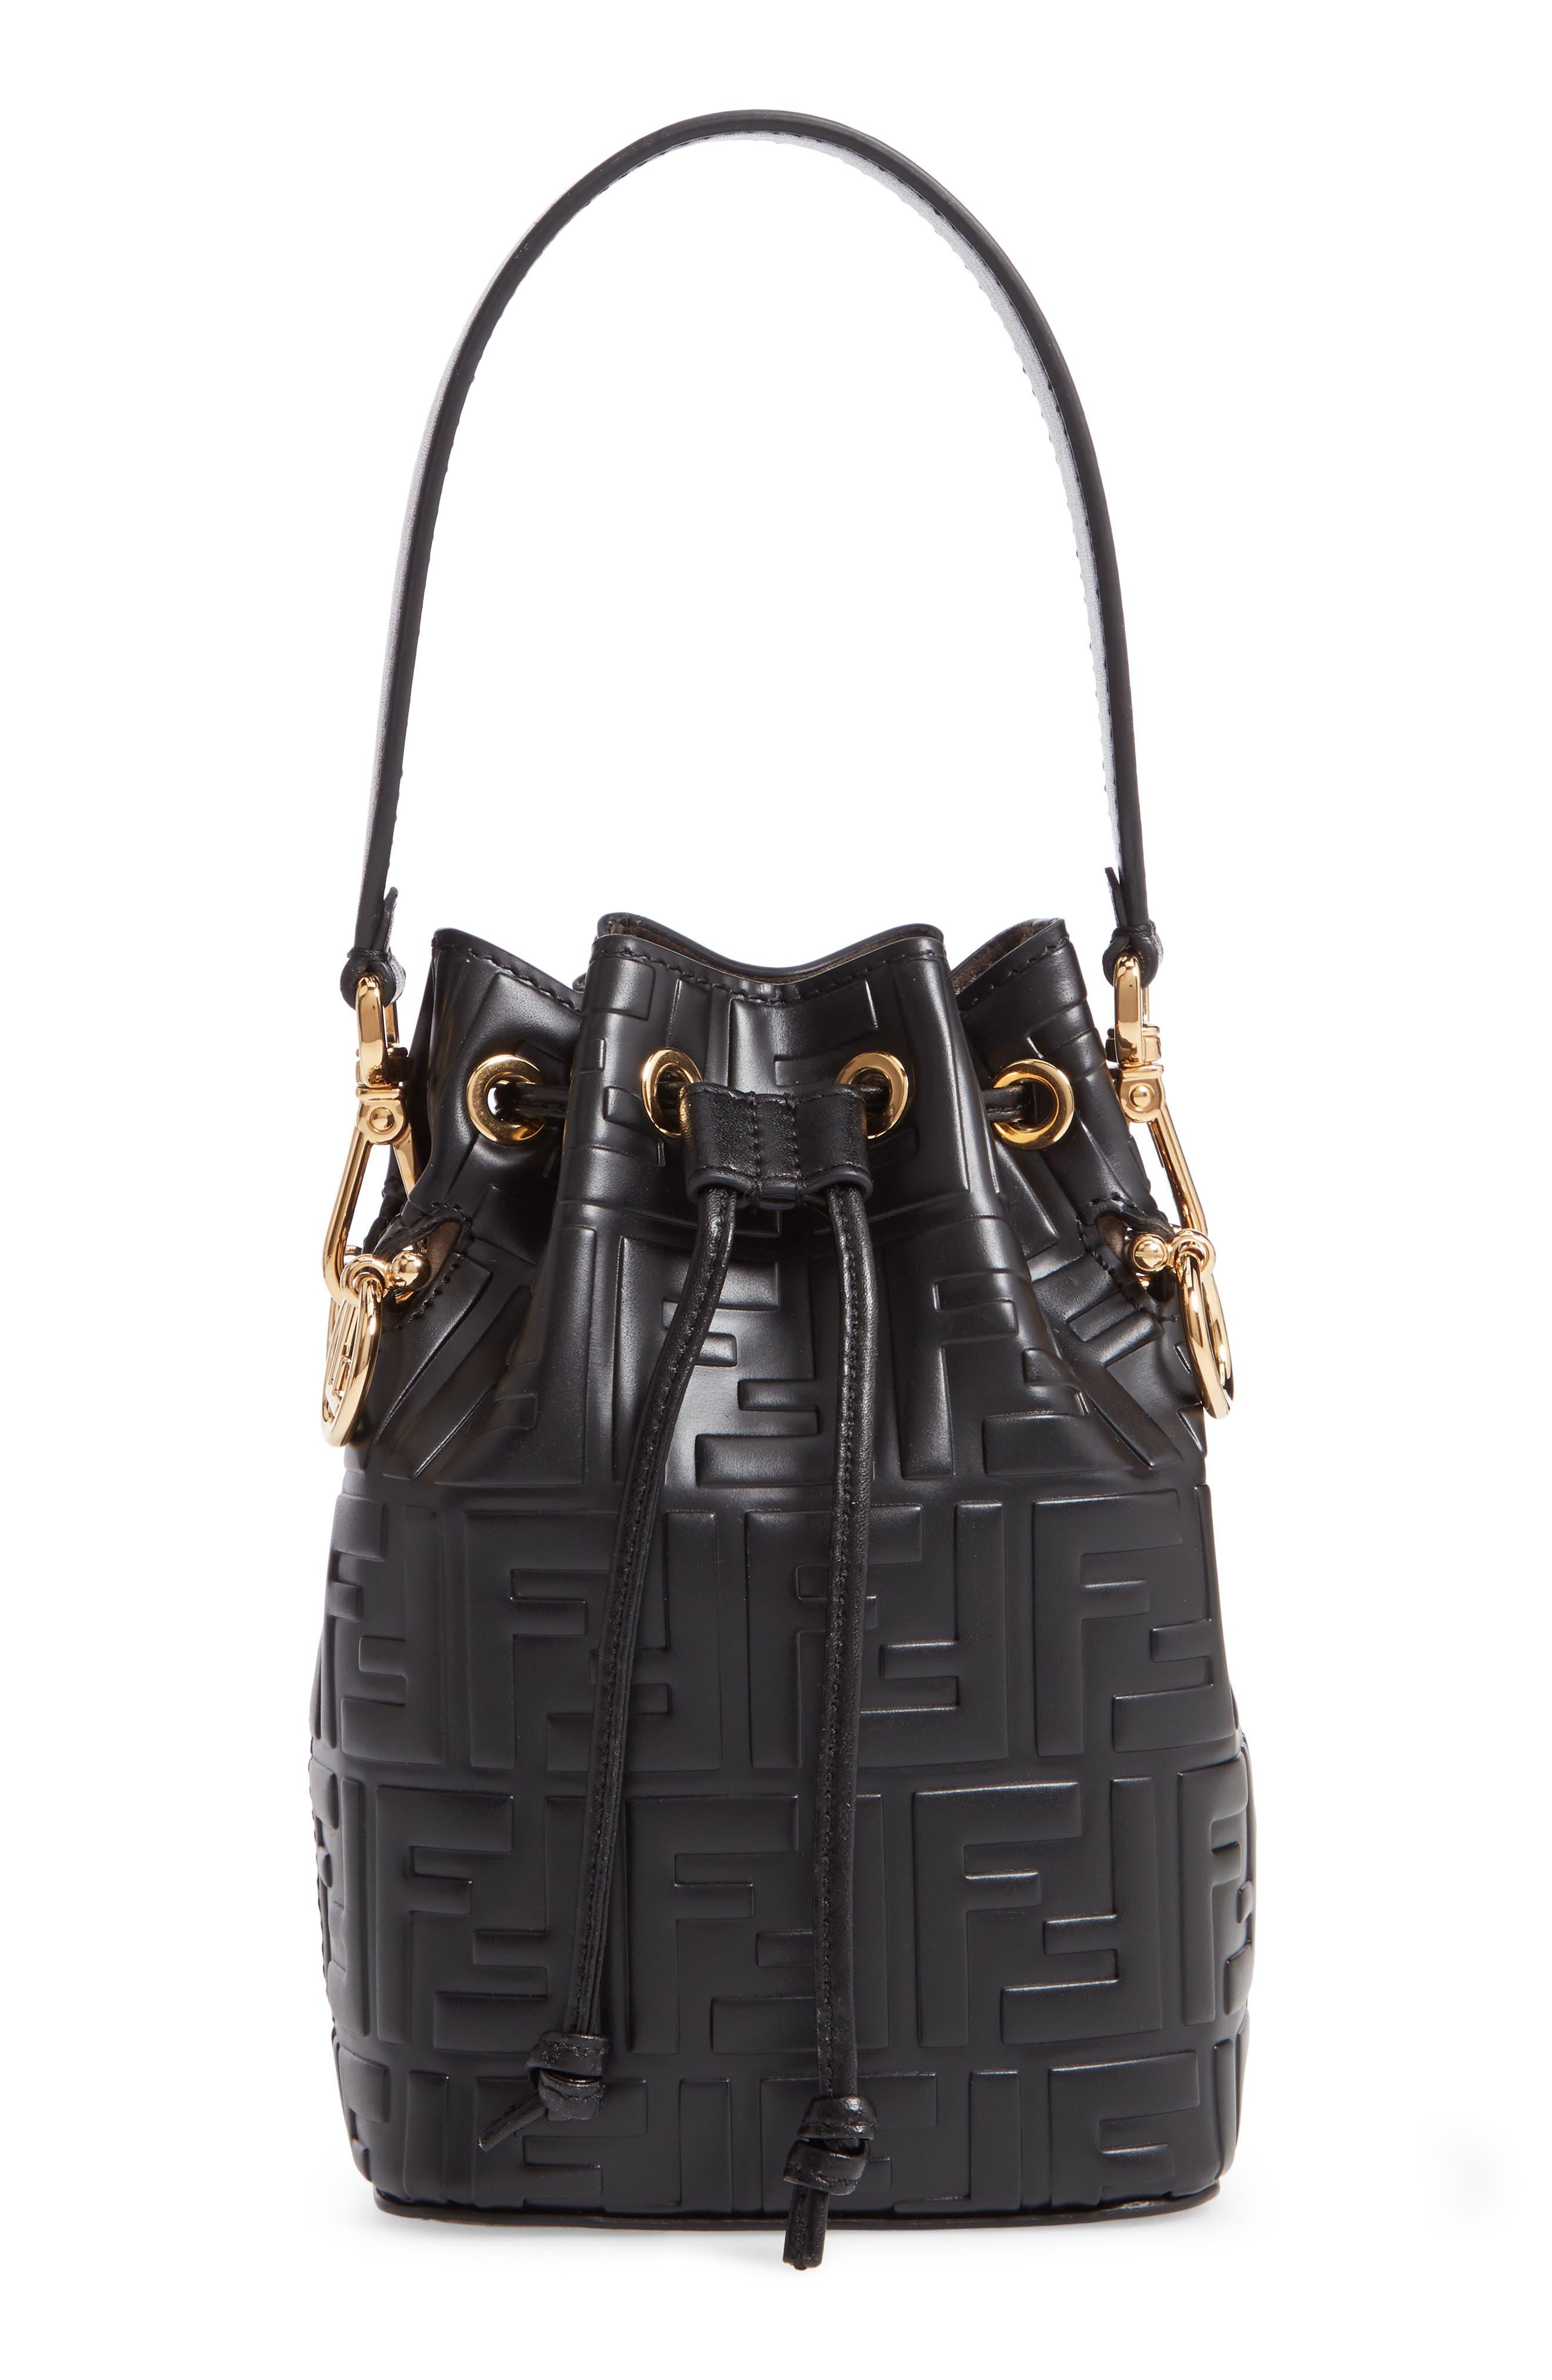 FENDI, Mini Mon Tresor Logo Leather Bucket Bag, Main thumbnail 1, color, NERO/ ORO SOFT